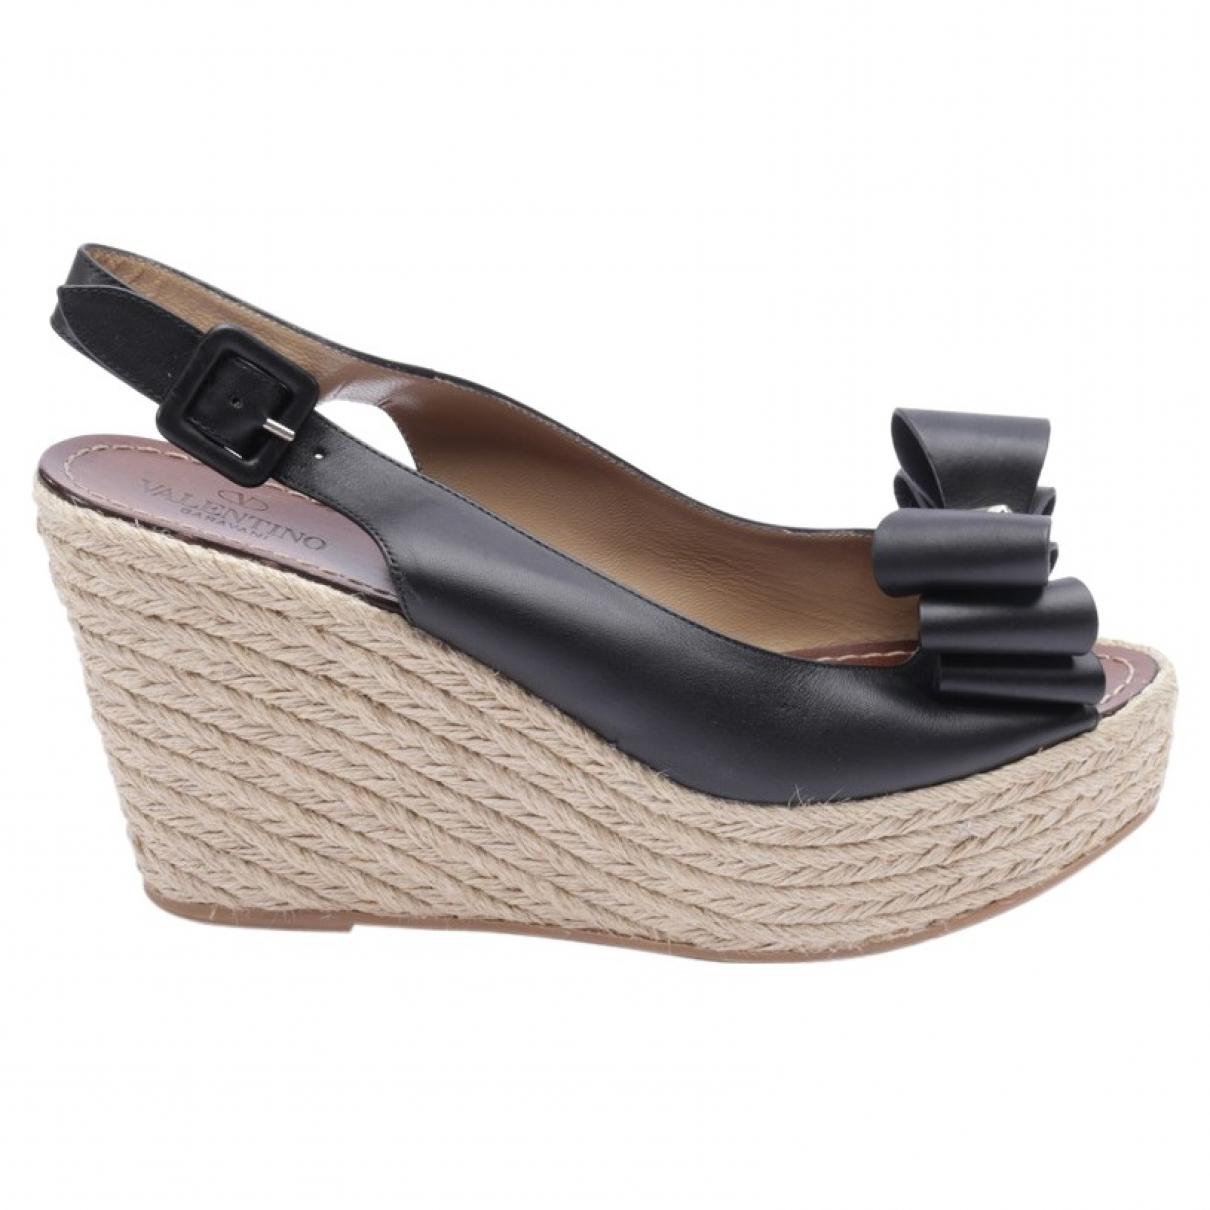 Valentino Garavani Rockstud Black Leather Sandals for Women 41 EU